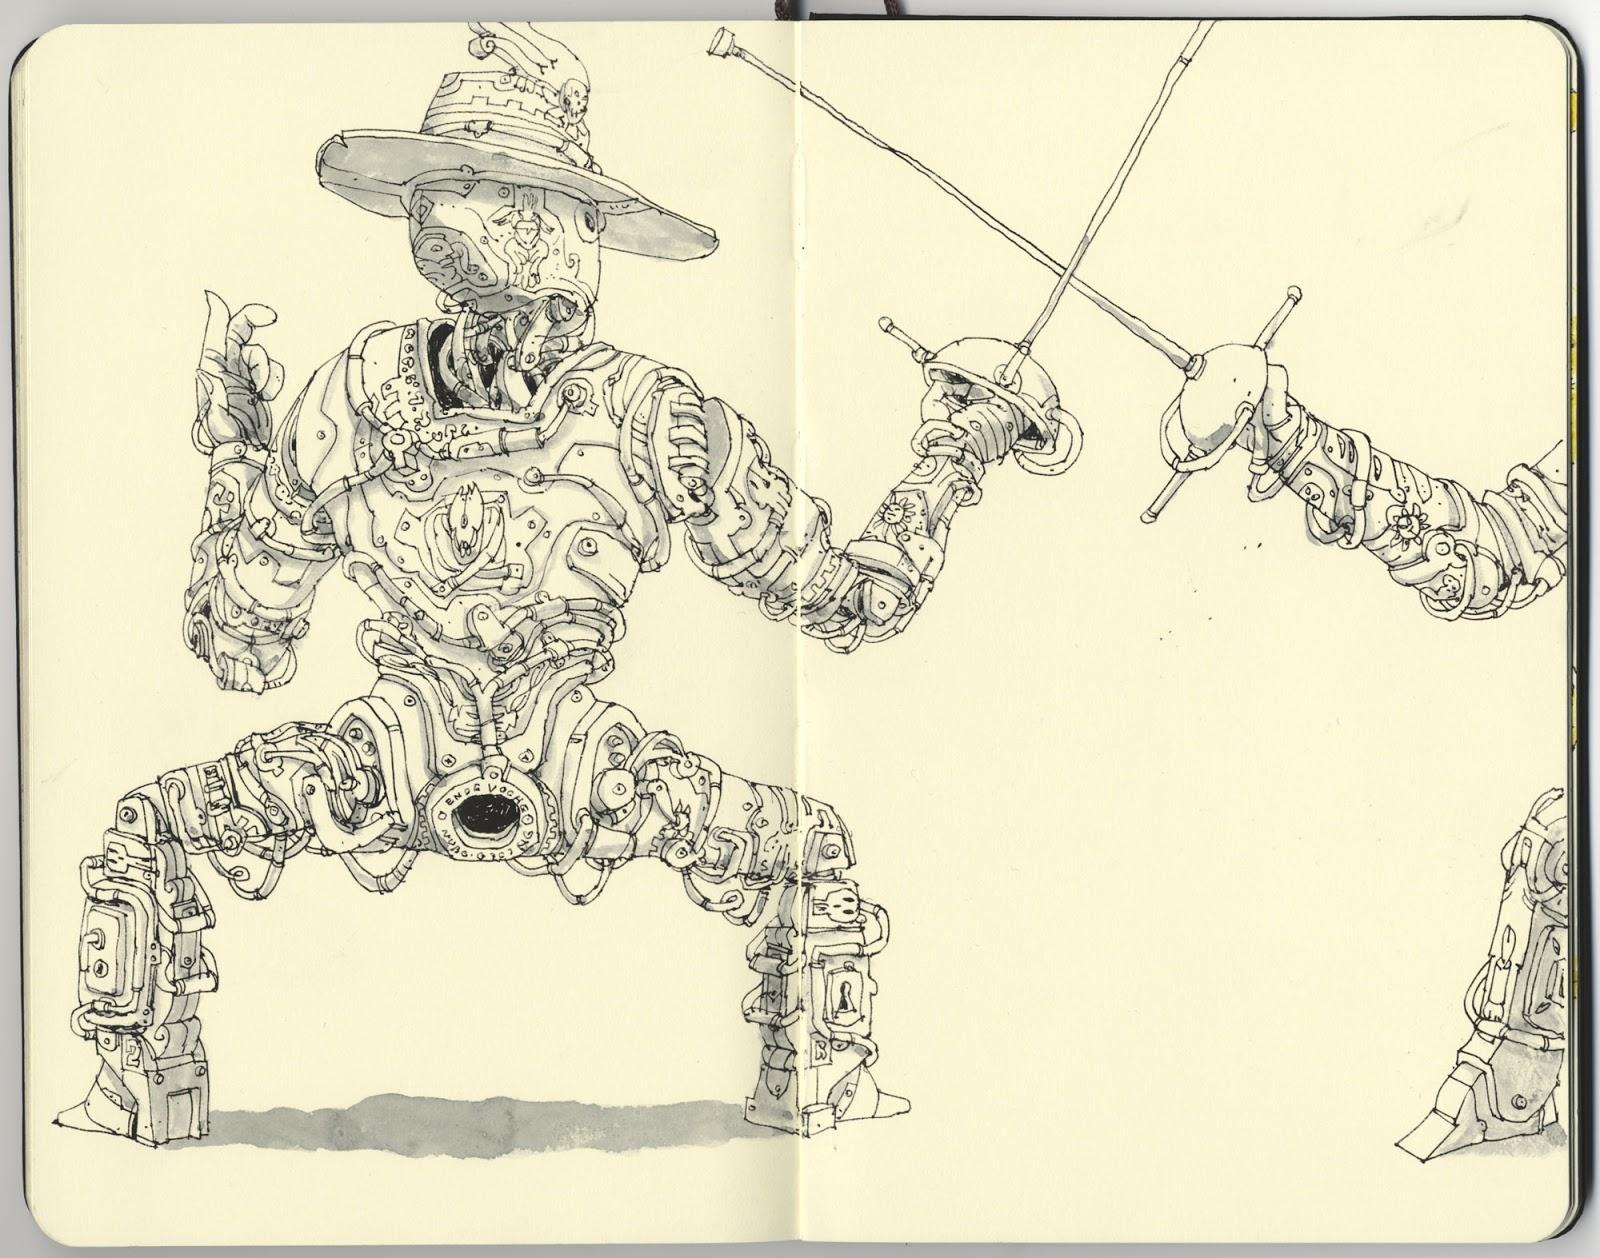 Mattias Adolfsson sketch illustration 4